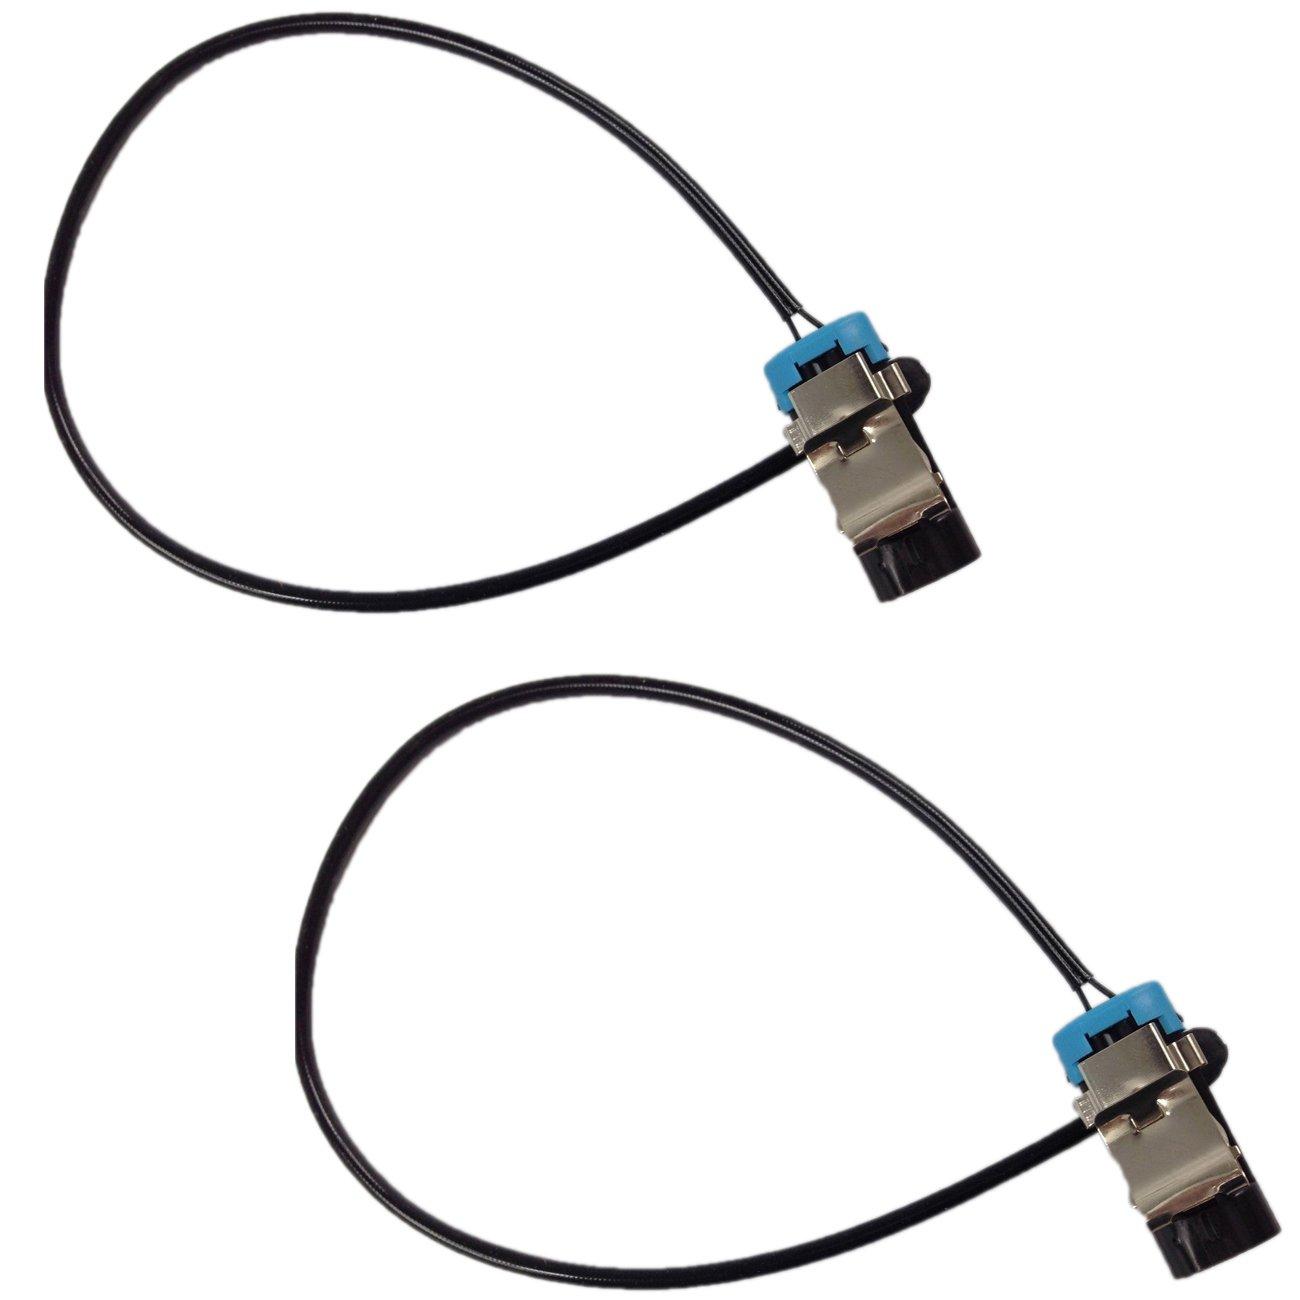 Bapmic 18026765 Front Brake Pad Wear Sensor Kit for Cadillac (Pack of 2)